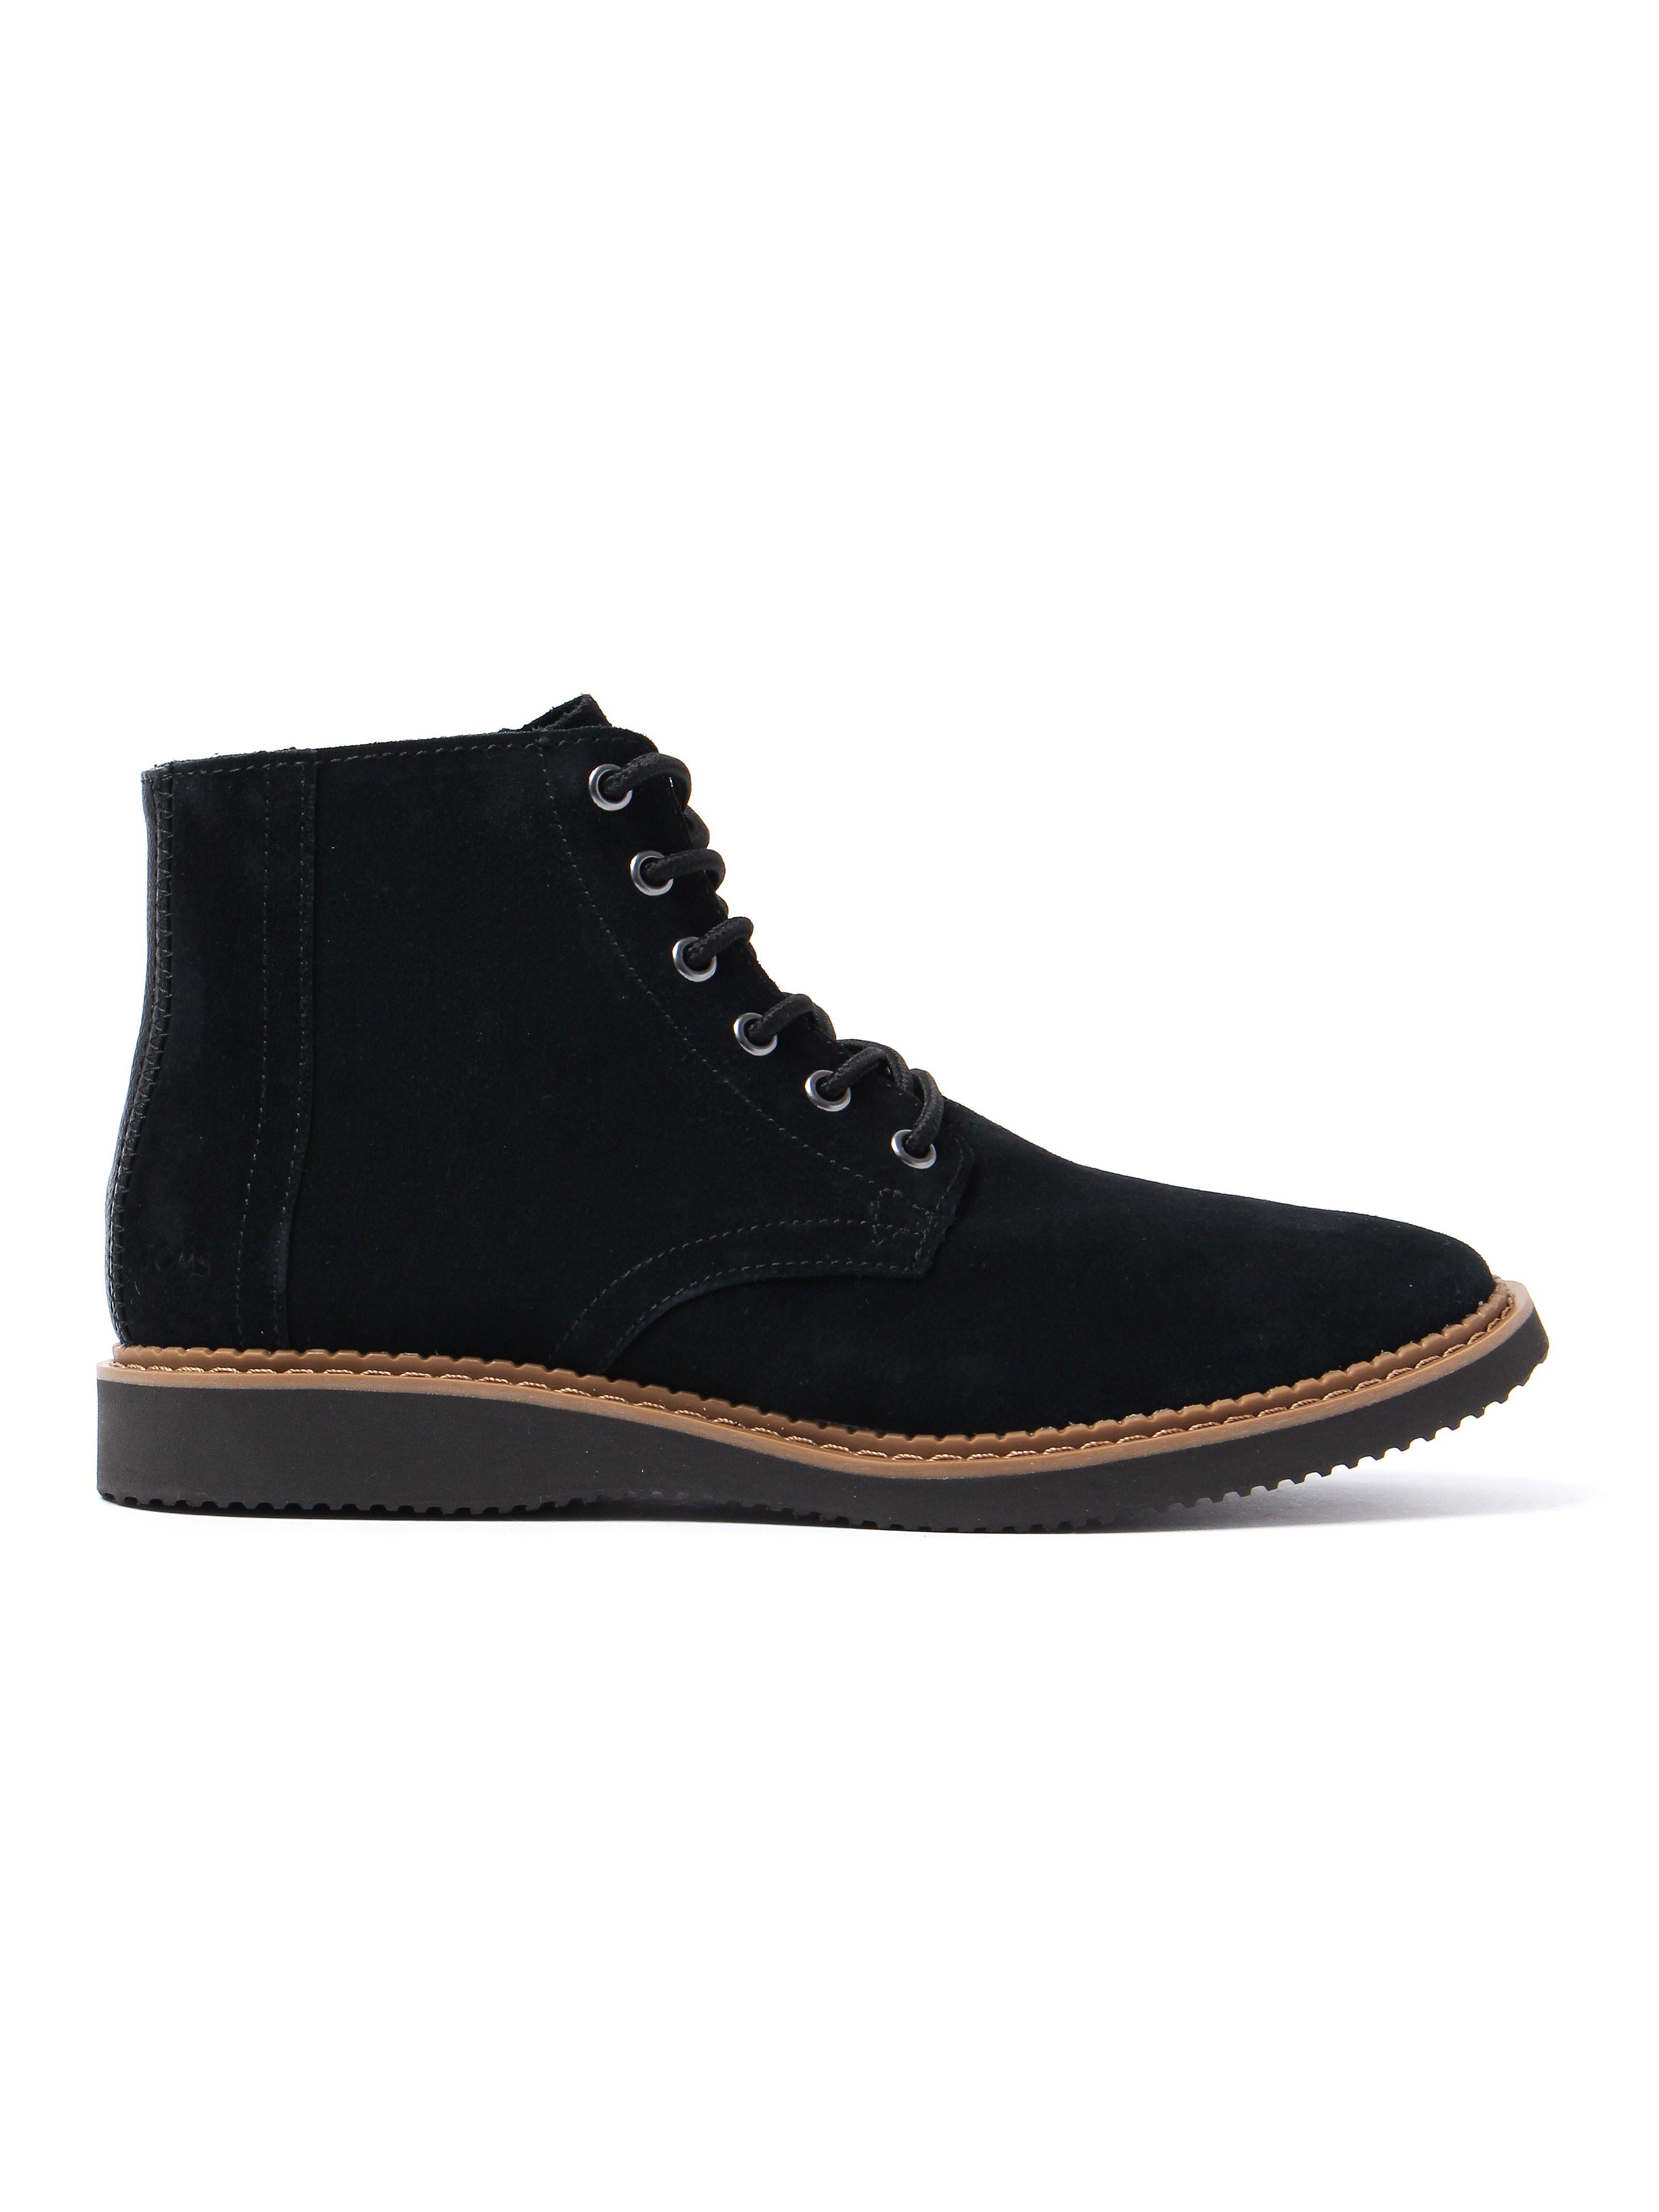 Toms Men's Porter Boots - Black Suede